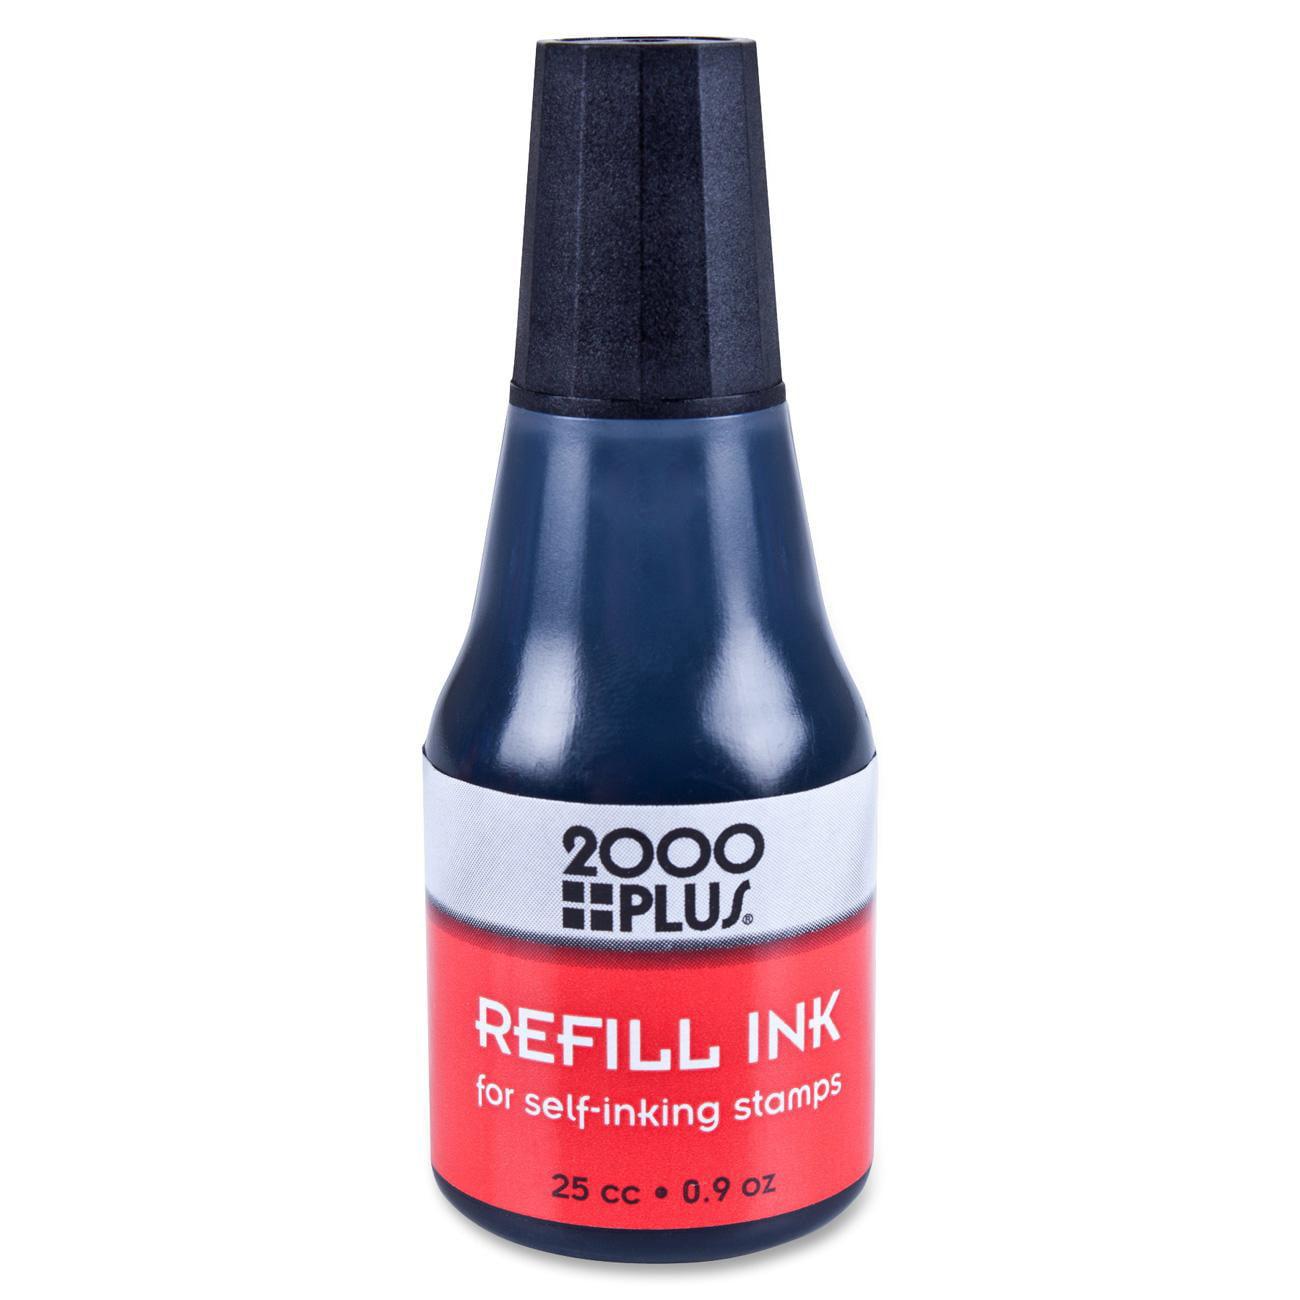 Self-inking Stamp Refill Liquid Ink